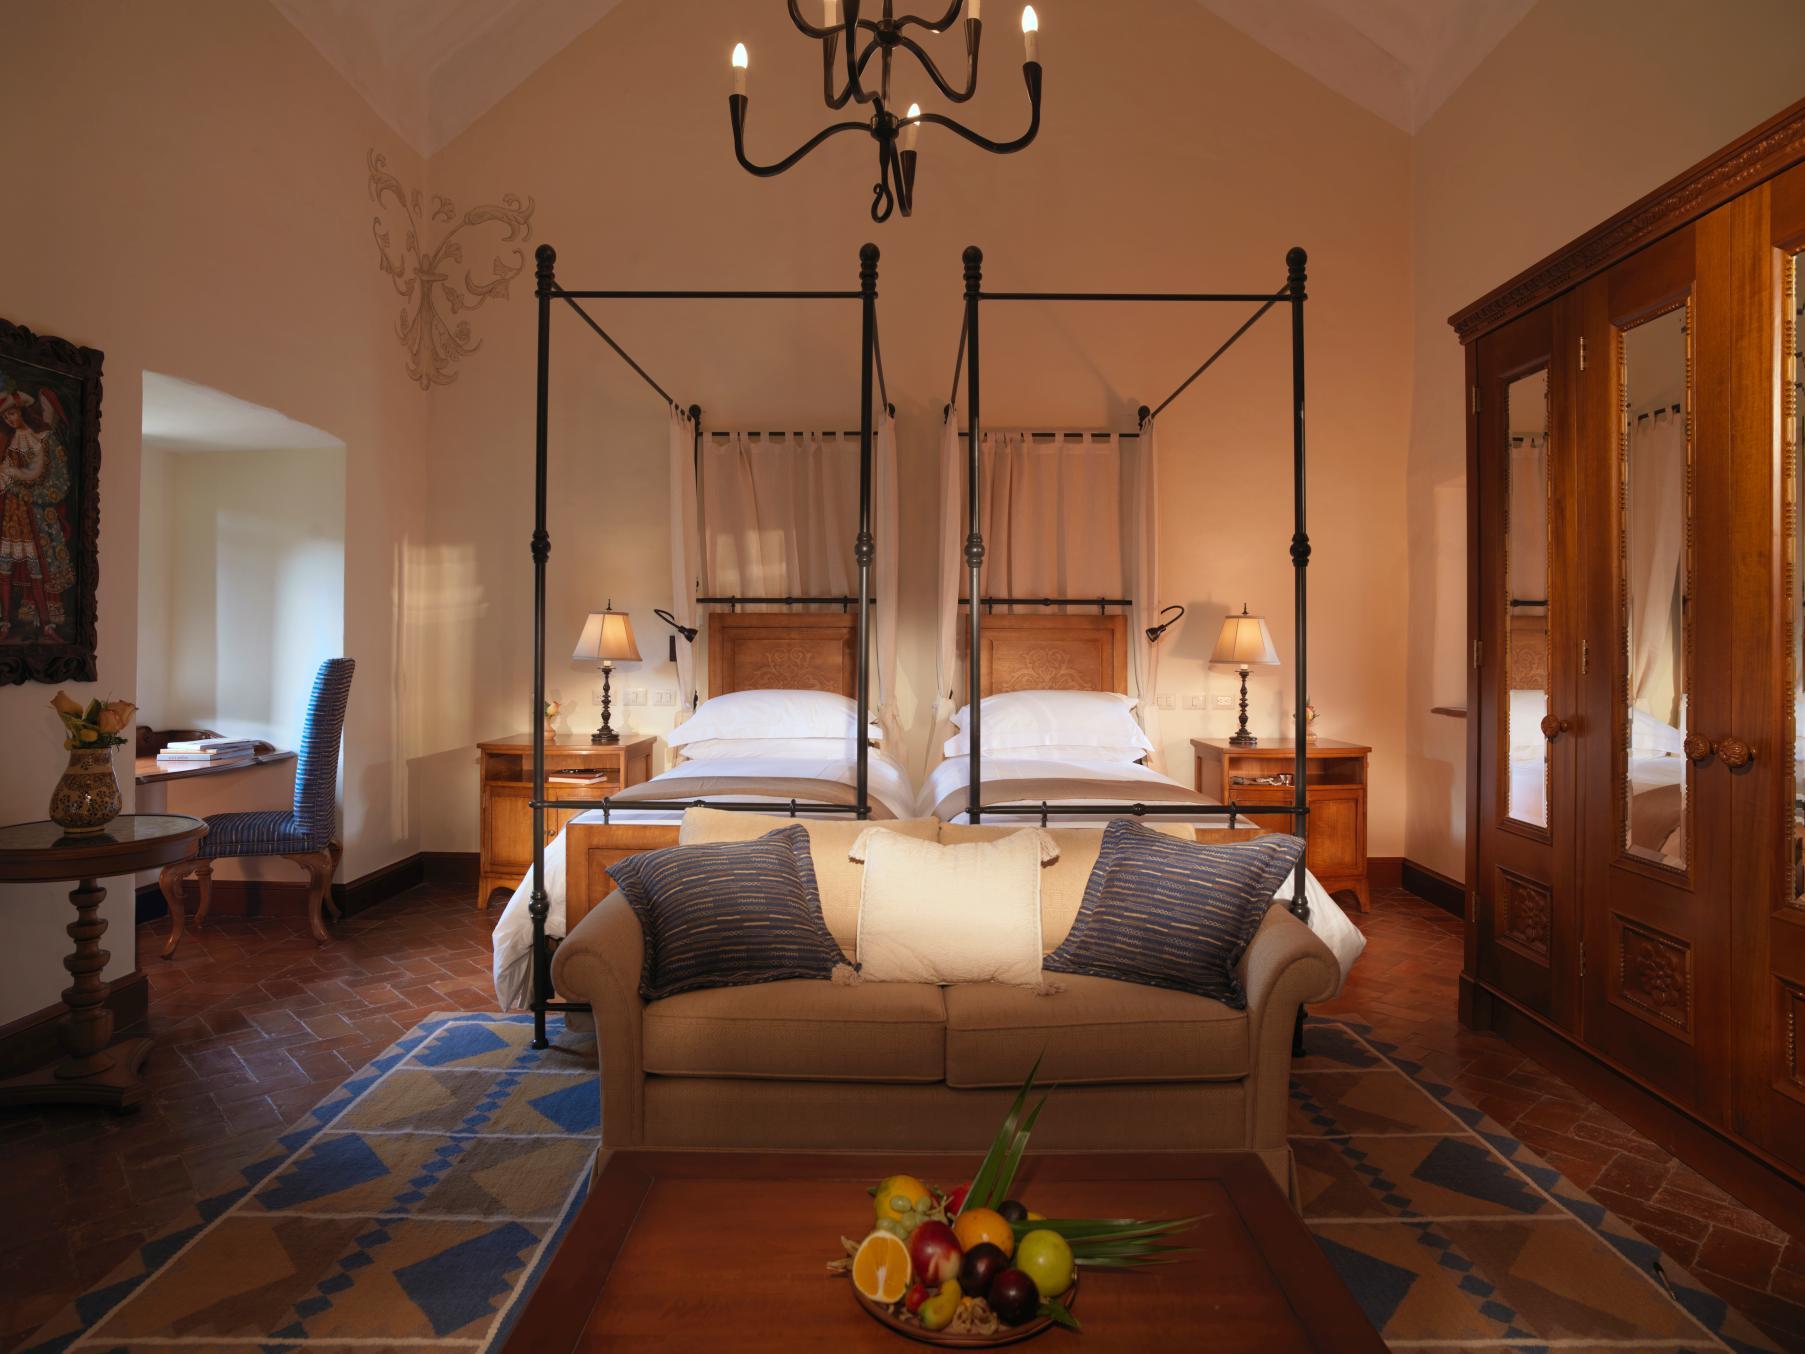 Belmond opens the luxurious doors to Palacio Nazarenas in Peru